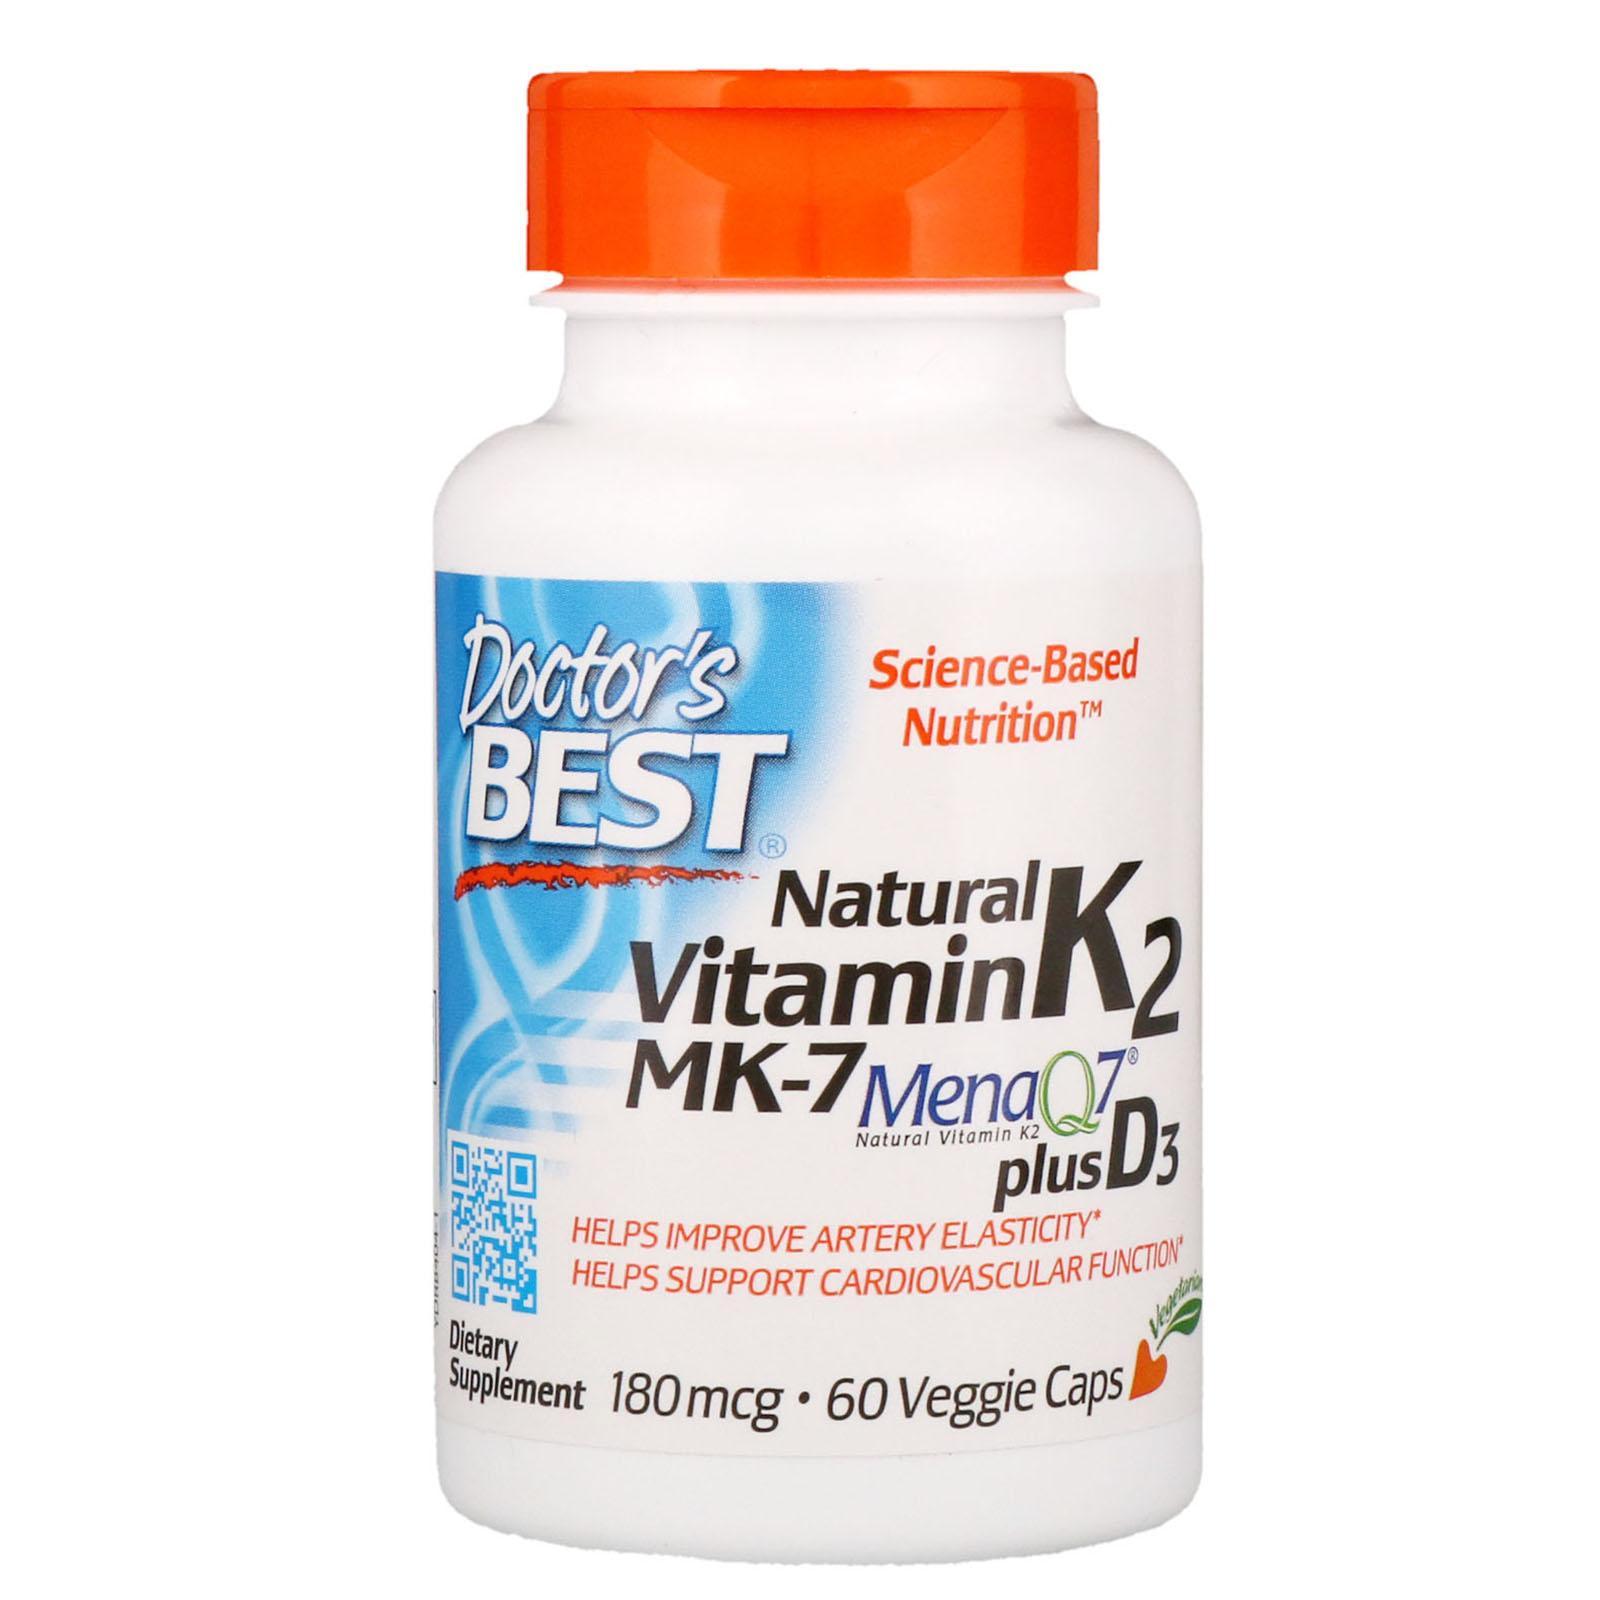 Doctor's Best Vitamin K2 MK-7 (MenaQ7), plus vitamin D3, 180 mcg, 60 rostlinných kapslí